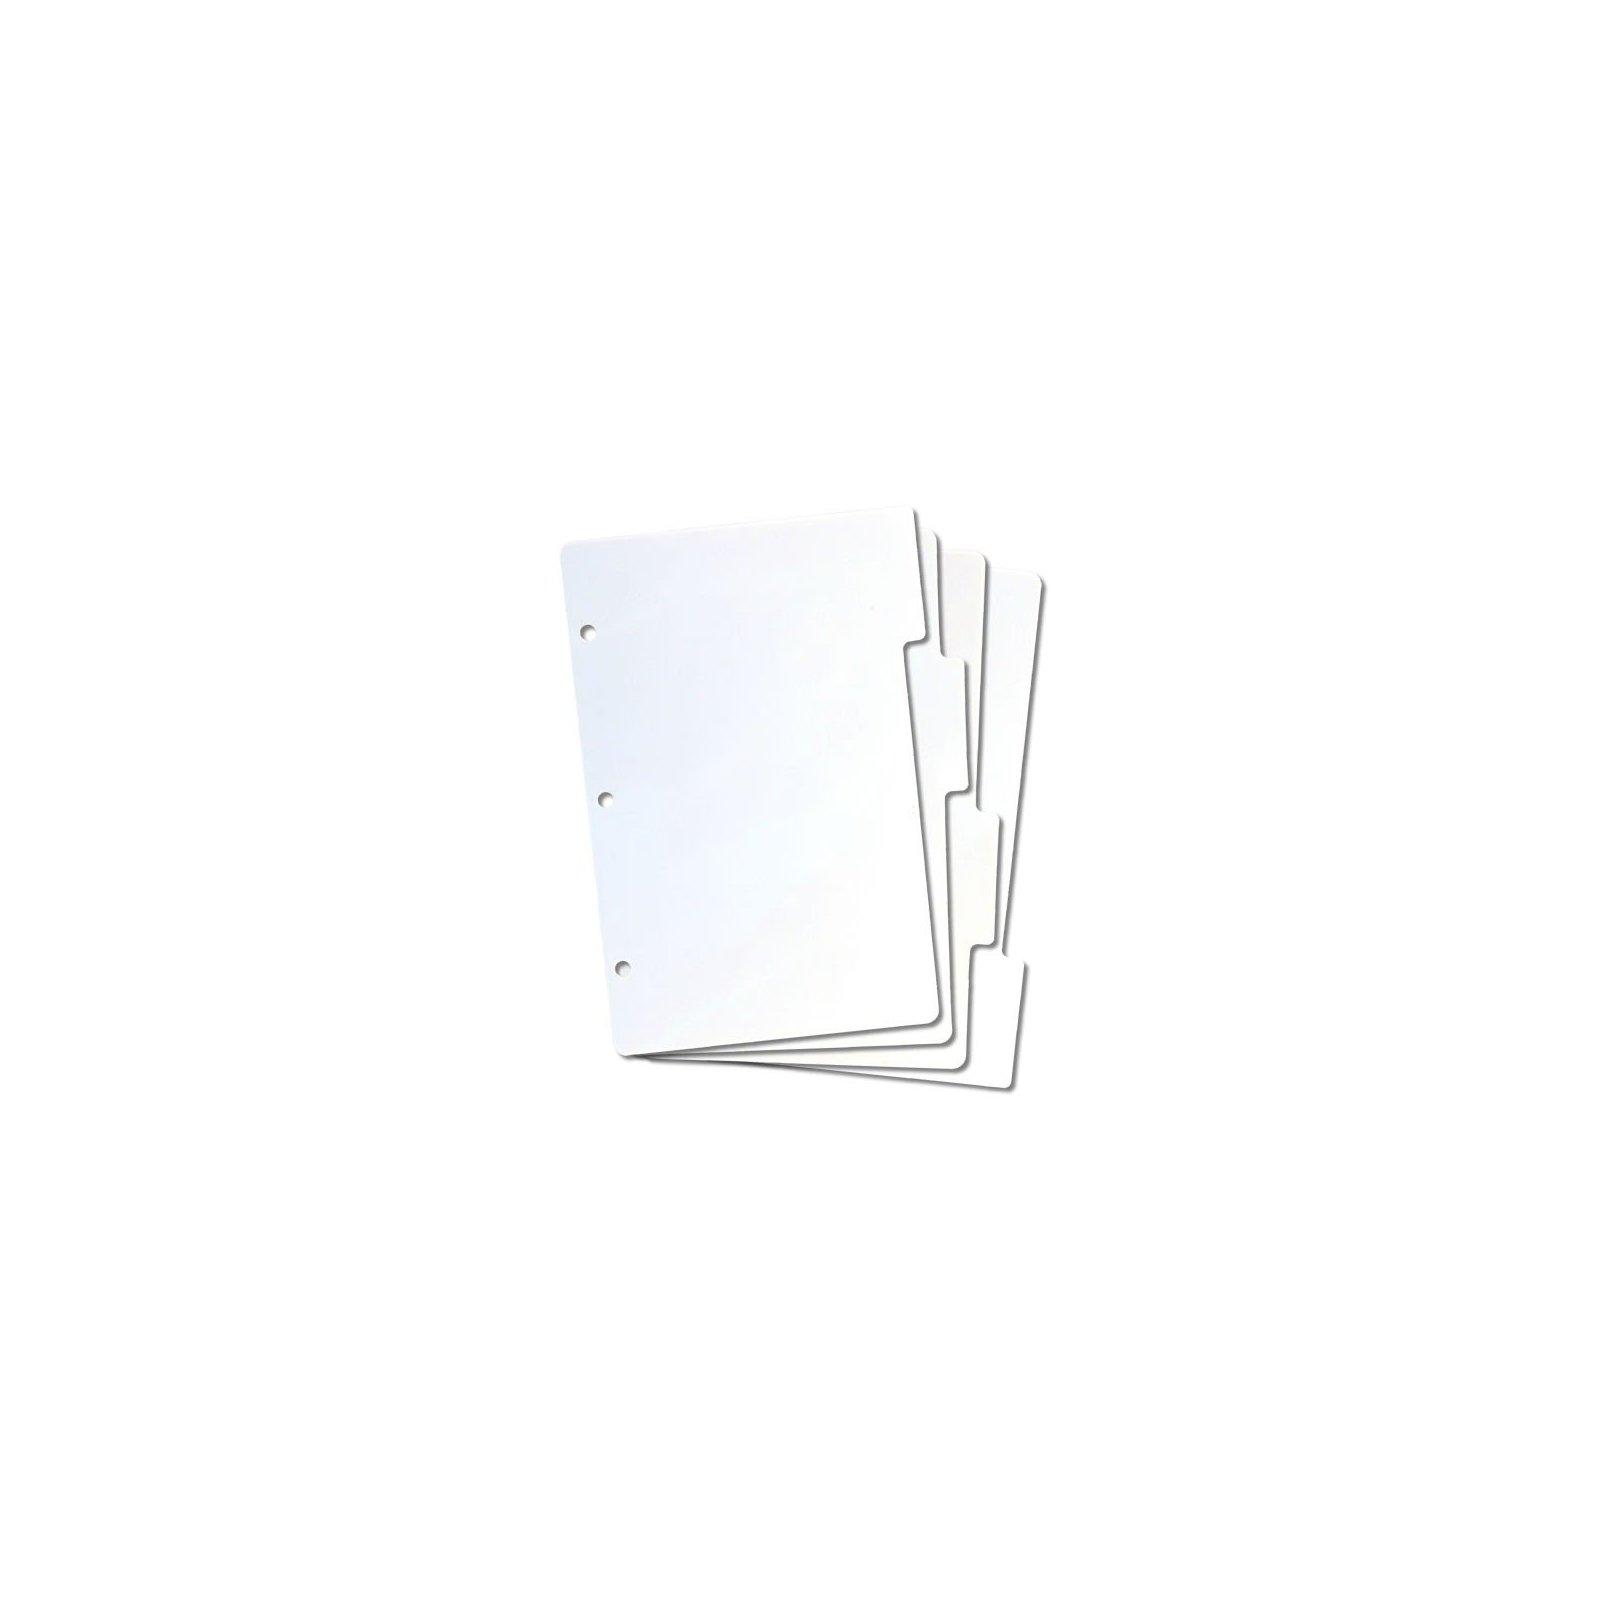 Lot de 4 intercalaires pour ranger les tampons clear - EZMount Mini Tabbed Storage Panels - Crafter's Companion